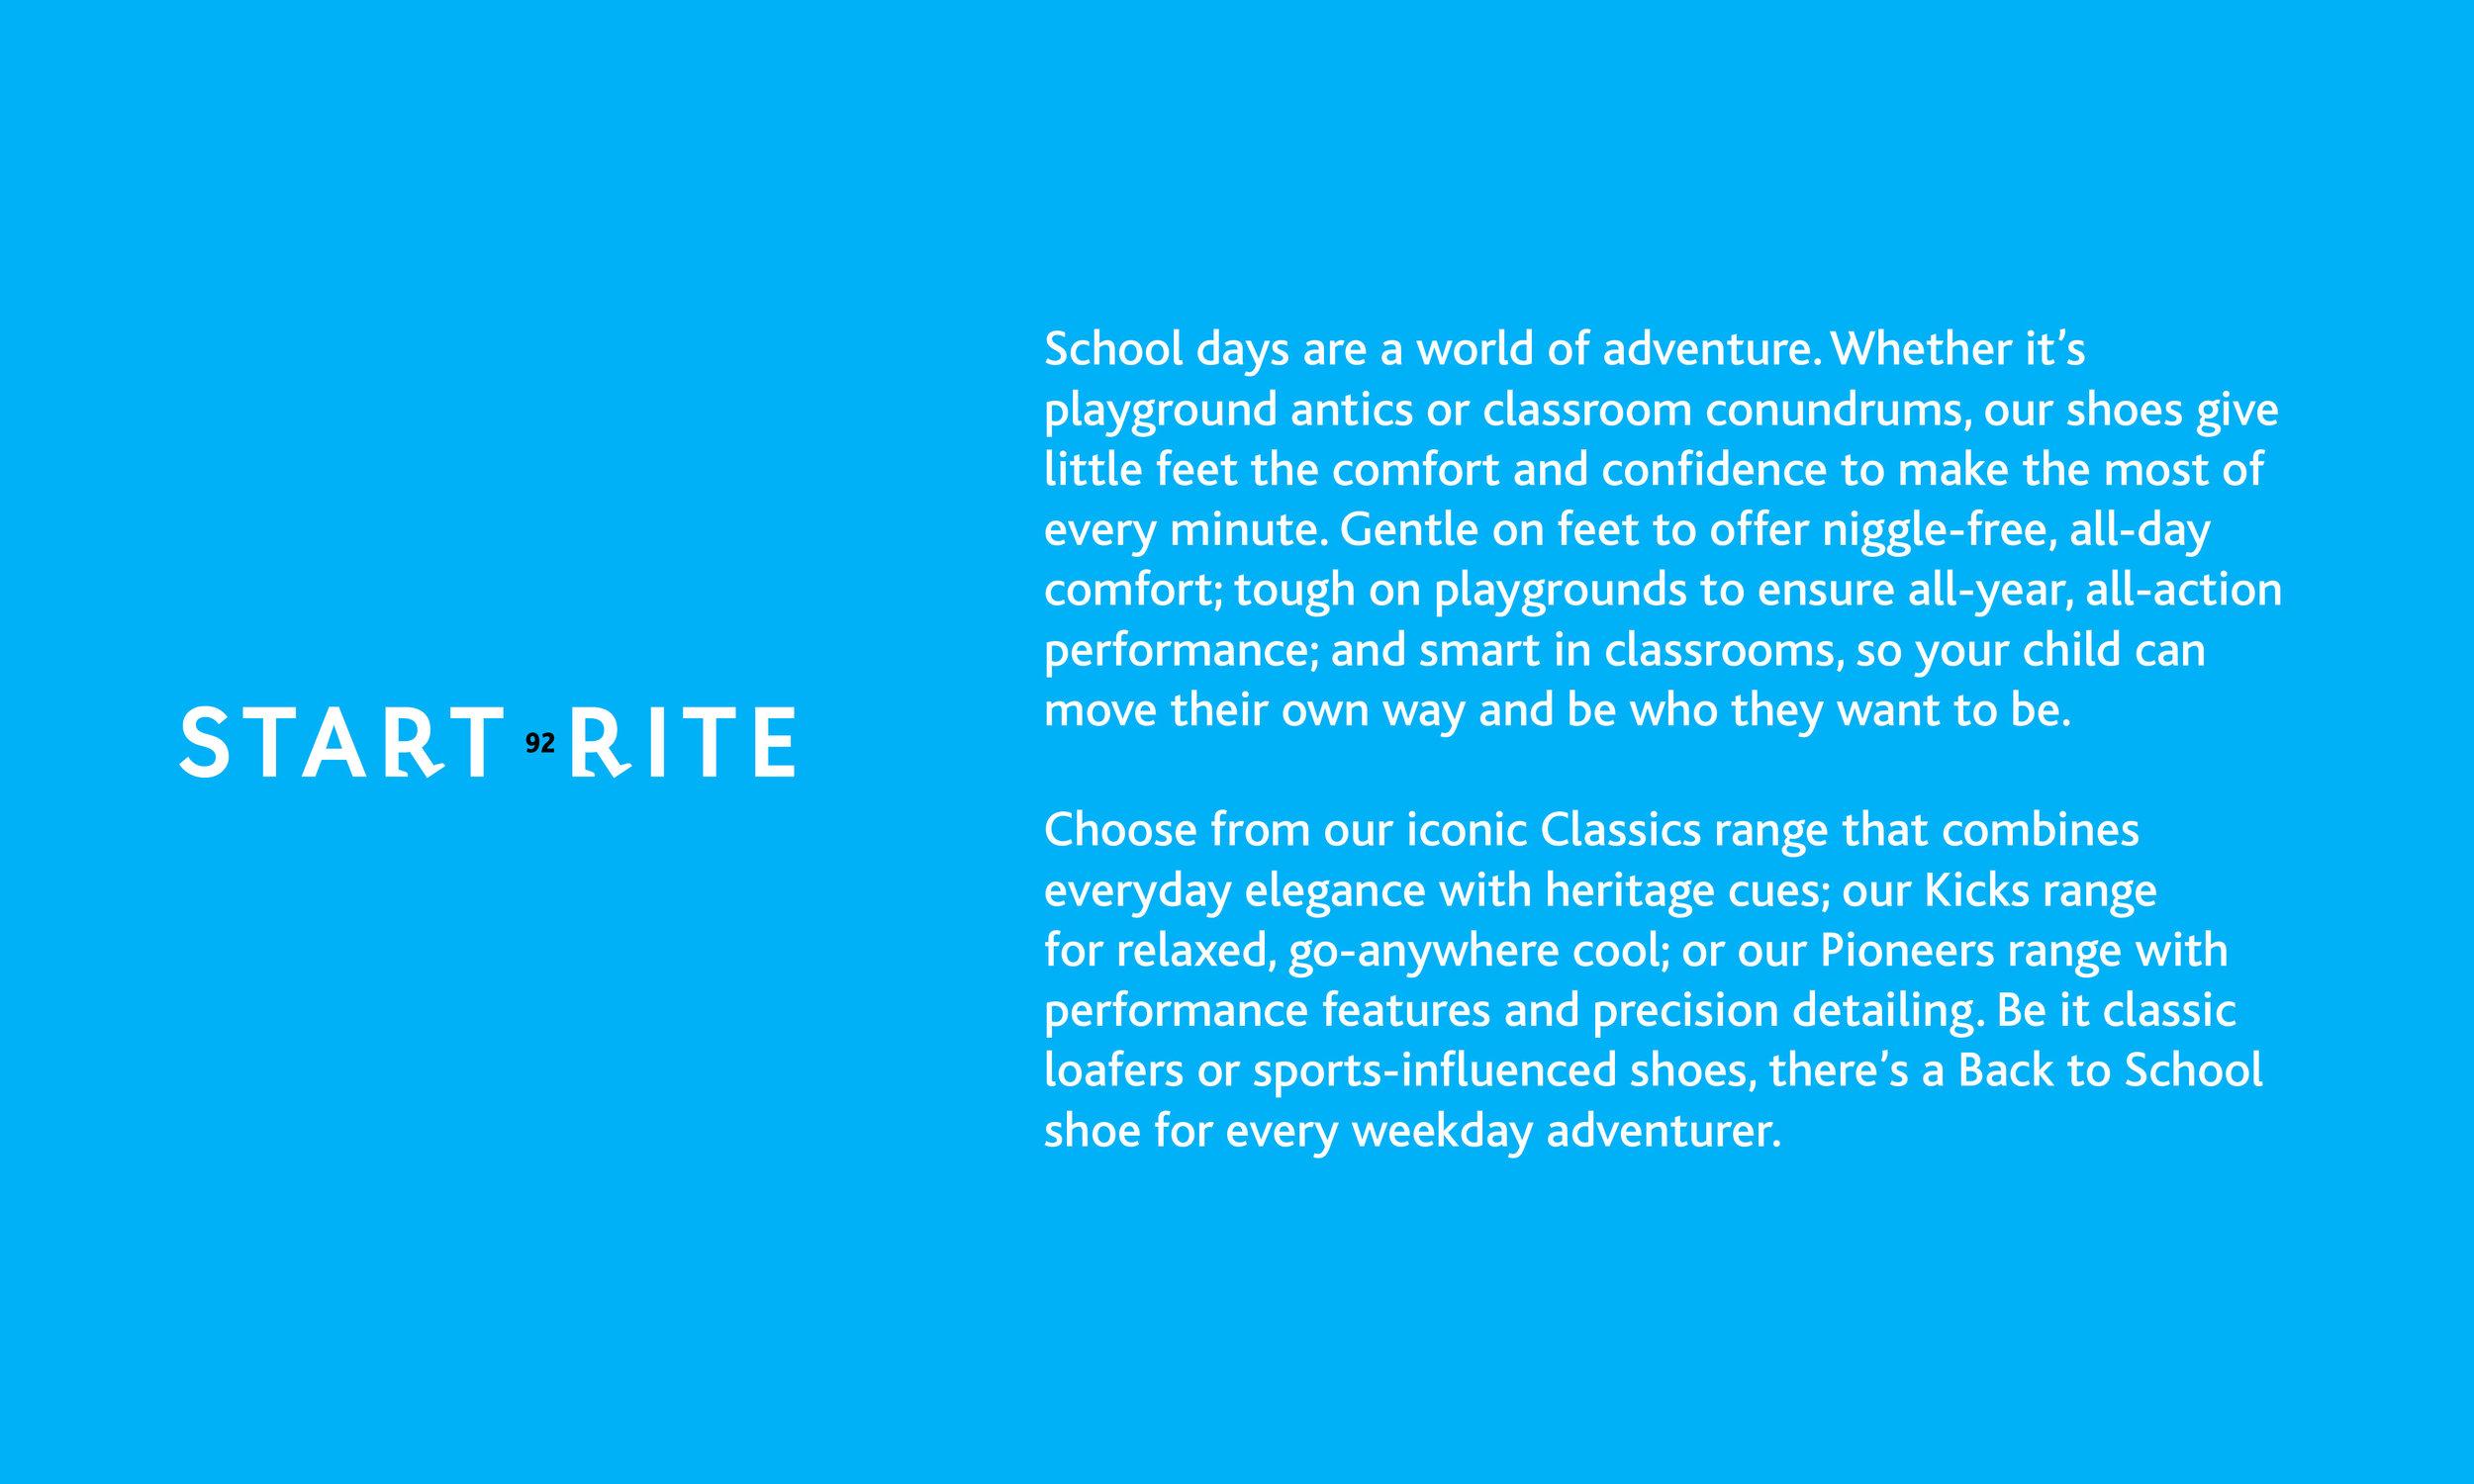 Client: Start-rite